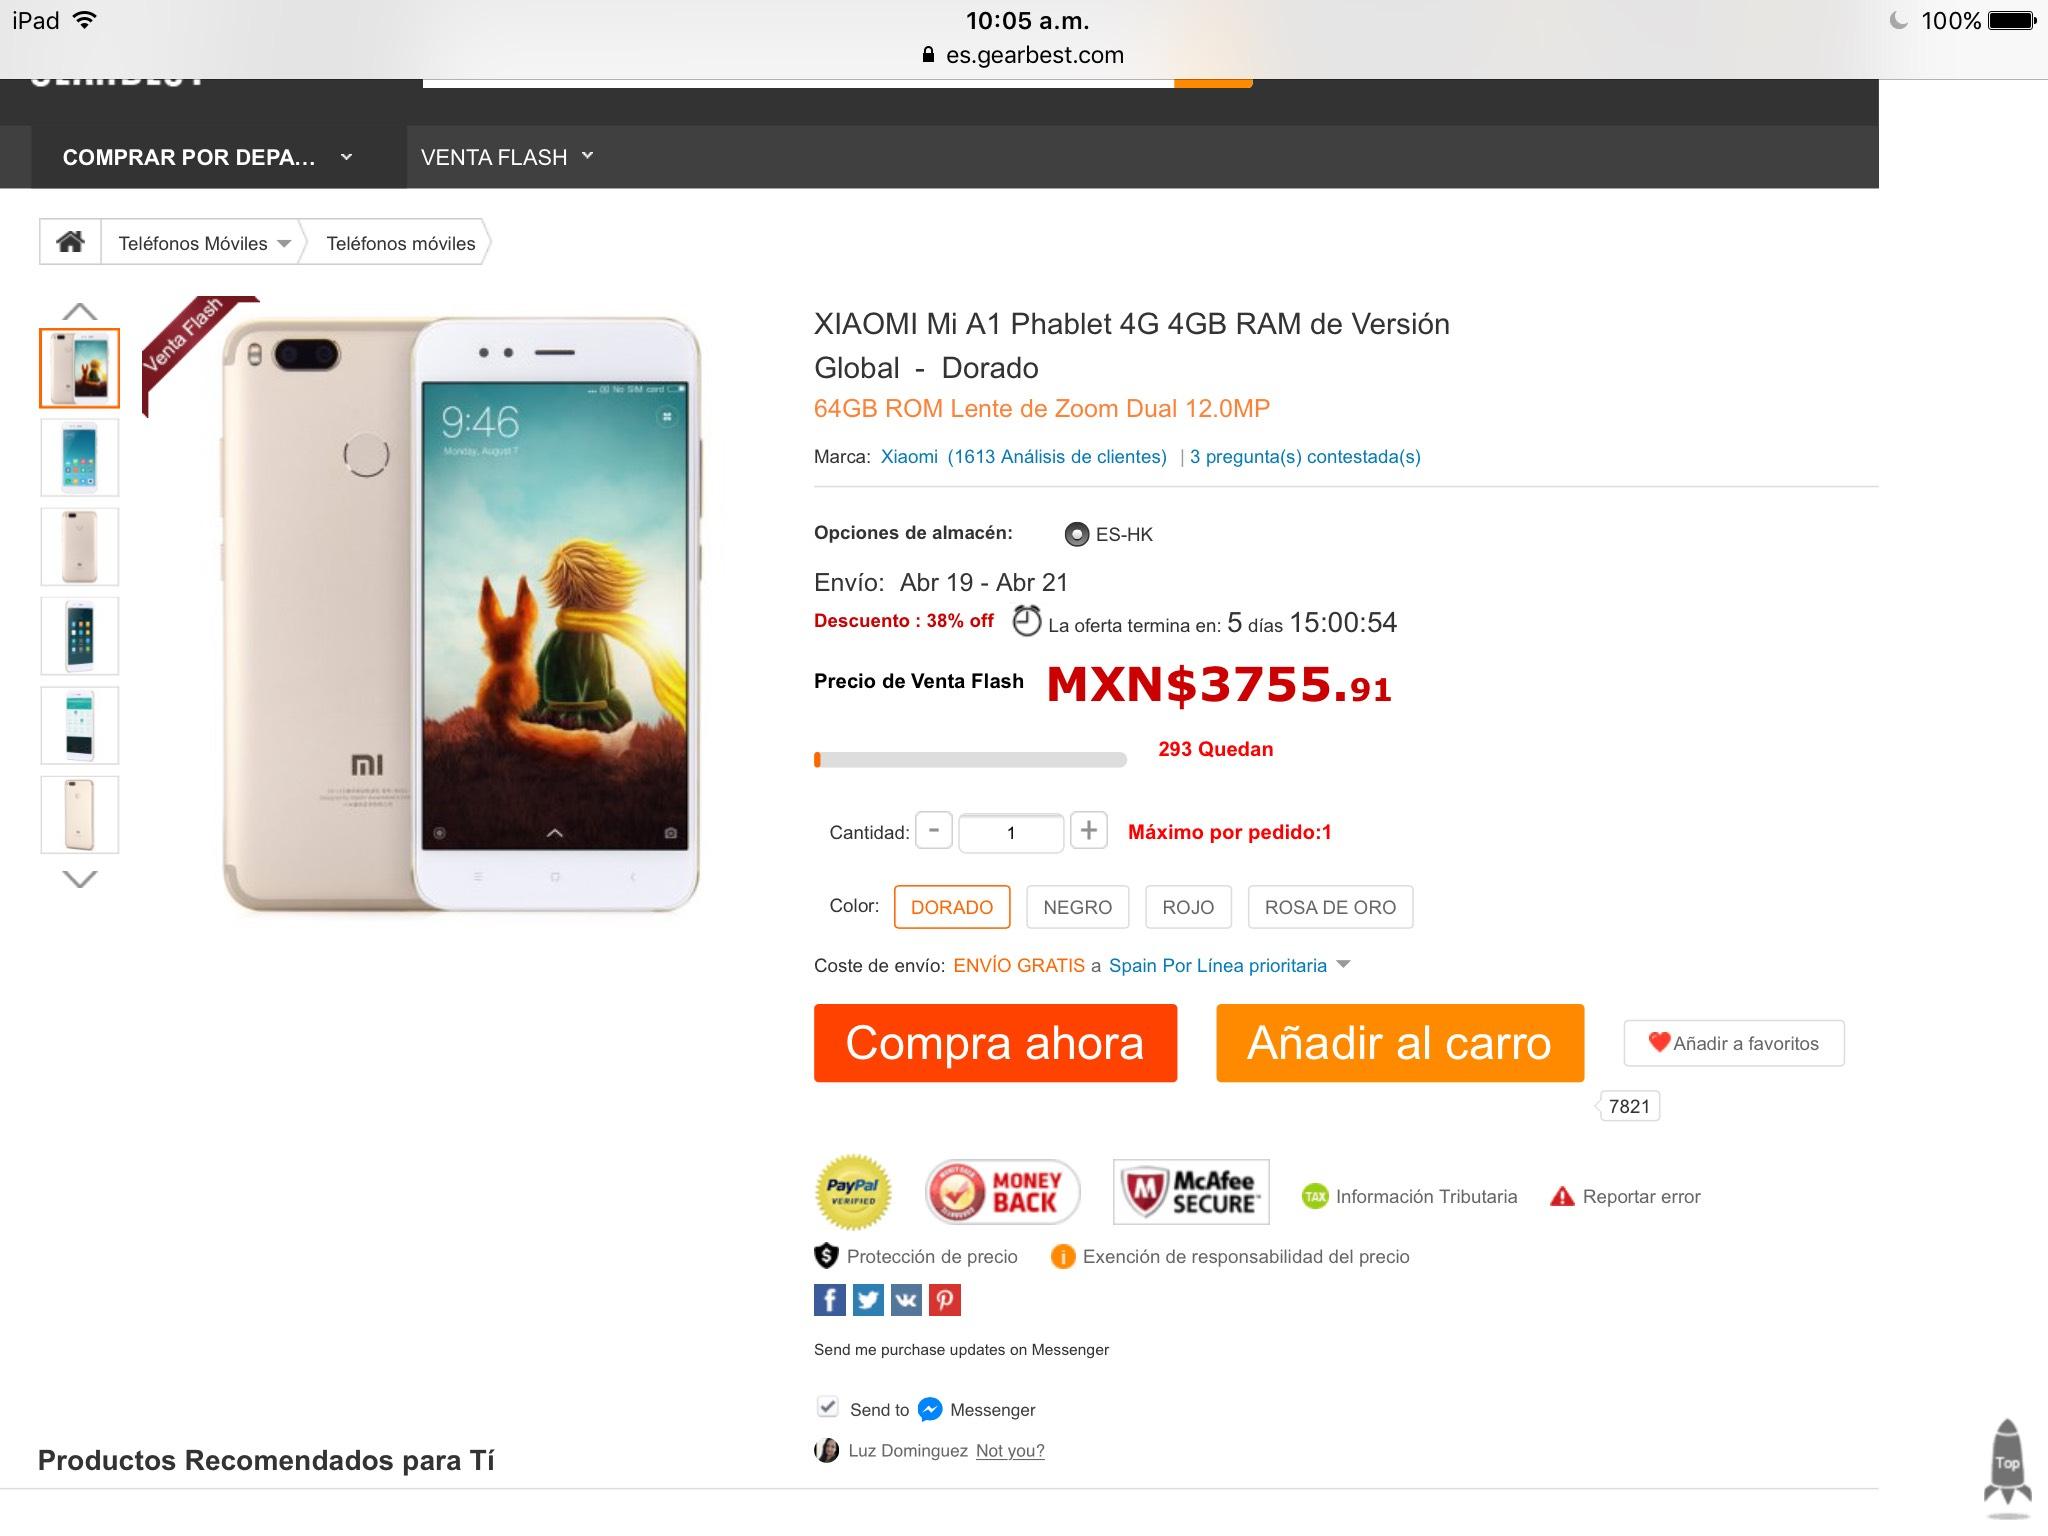 GearBest: XIAOMI Mi A1 Phablet 4G 4GB RAM de Versión Global  -  Dorado